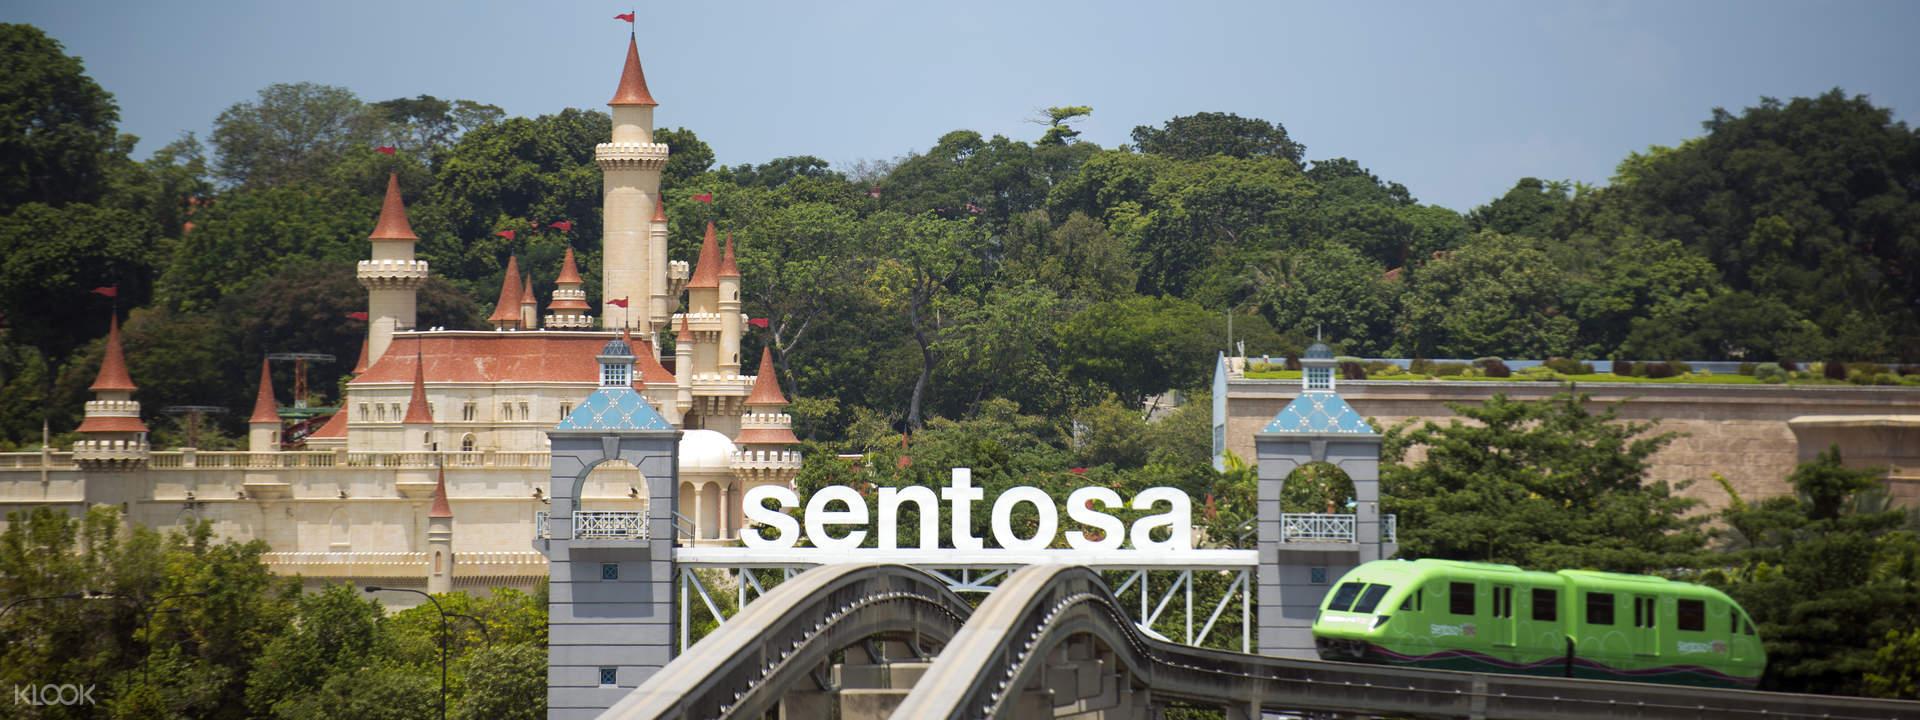 "Sentosa Express"""